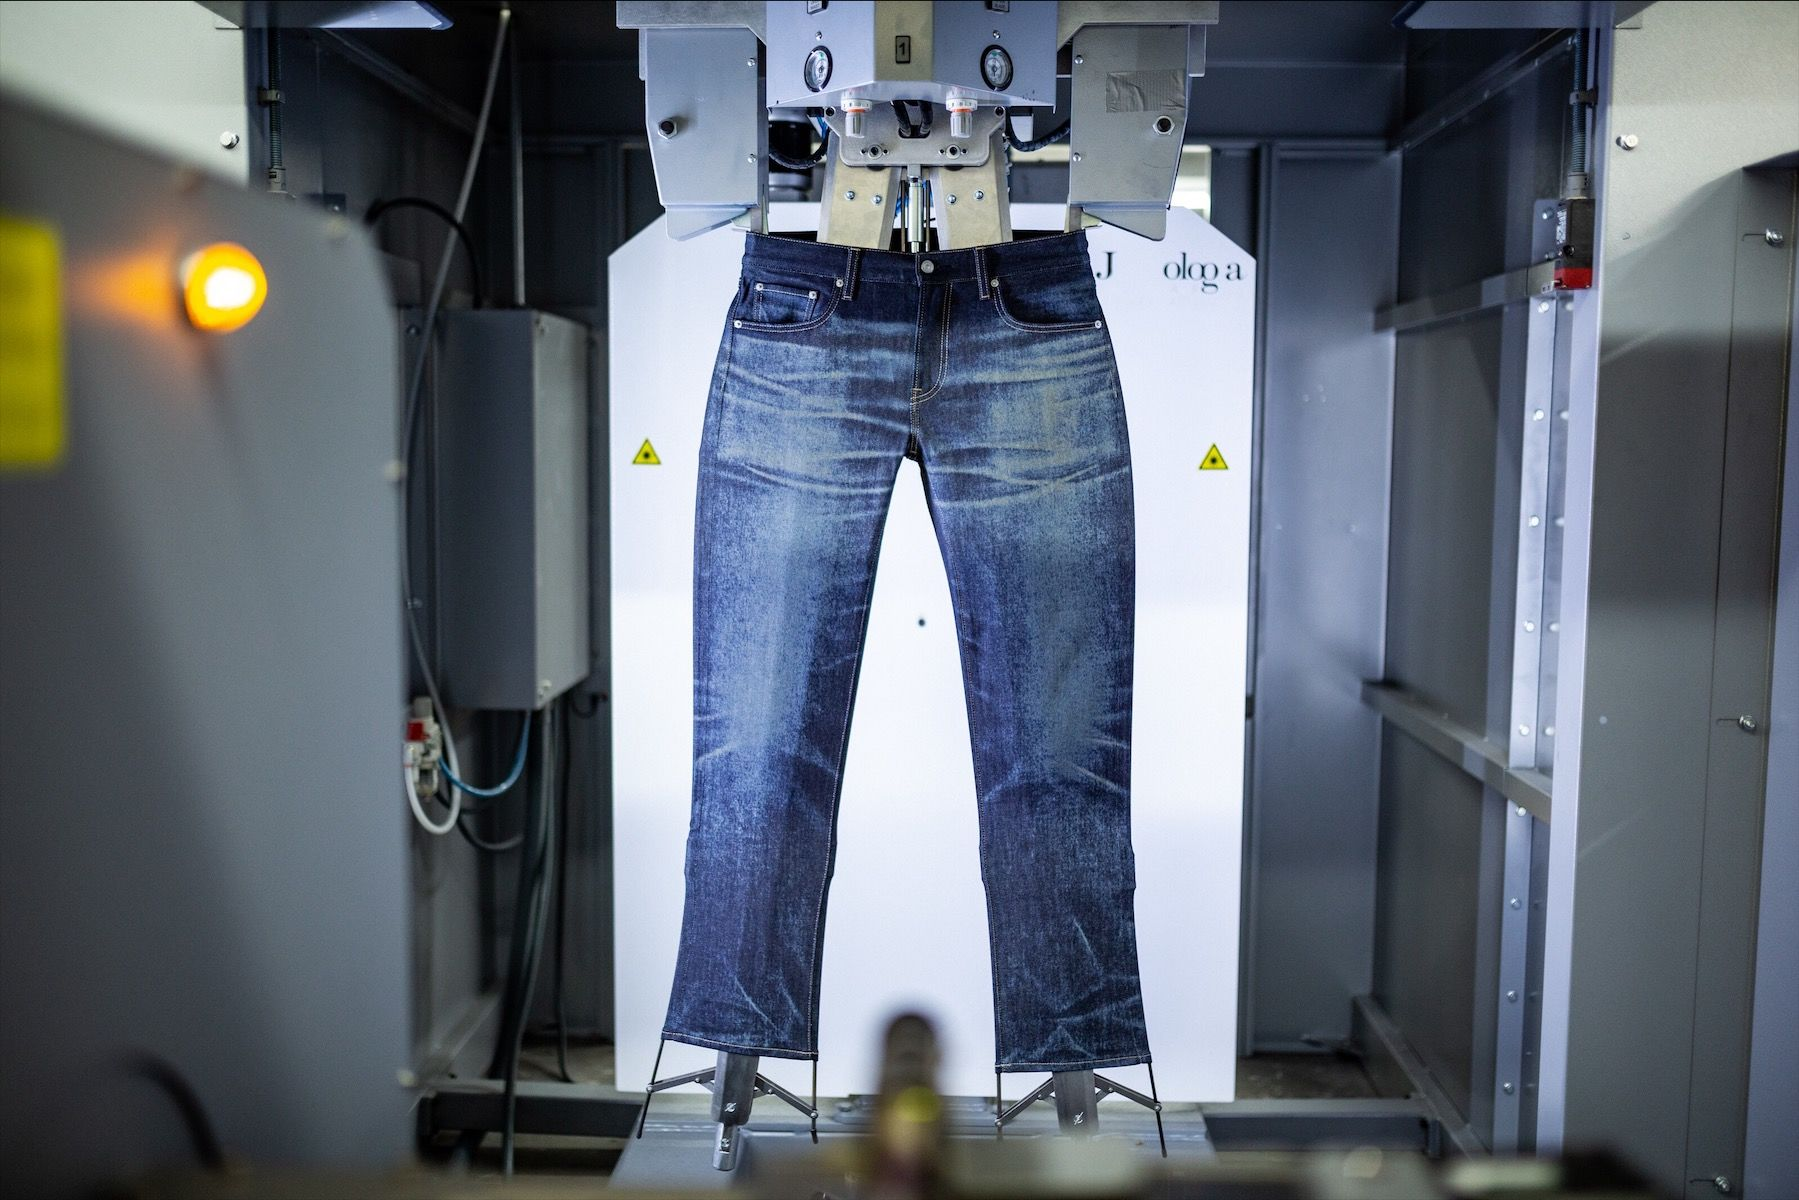 Evolusi Pembuatan Jeans dari Cara Tradisional hingga Kekinian